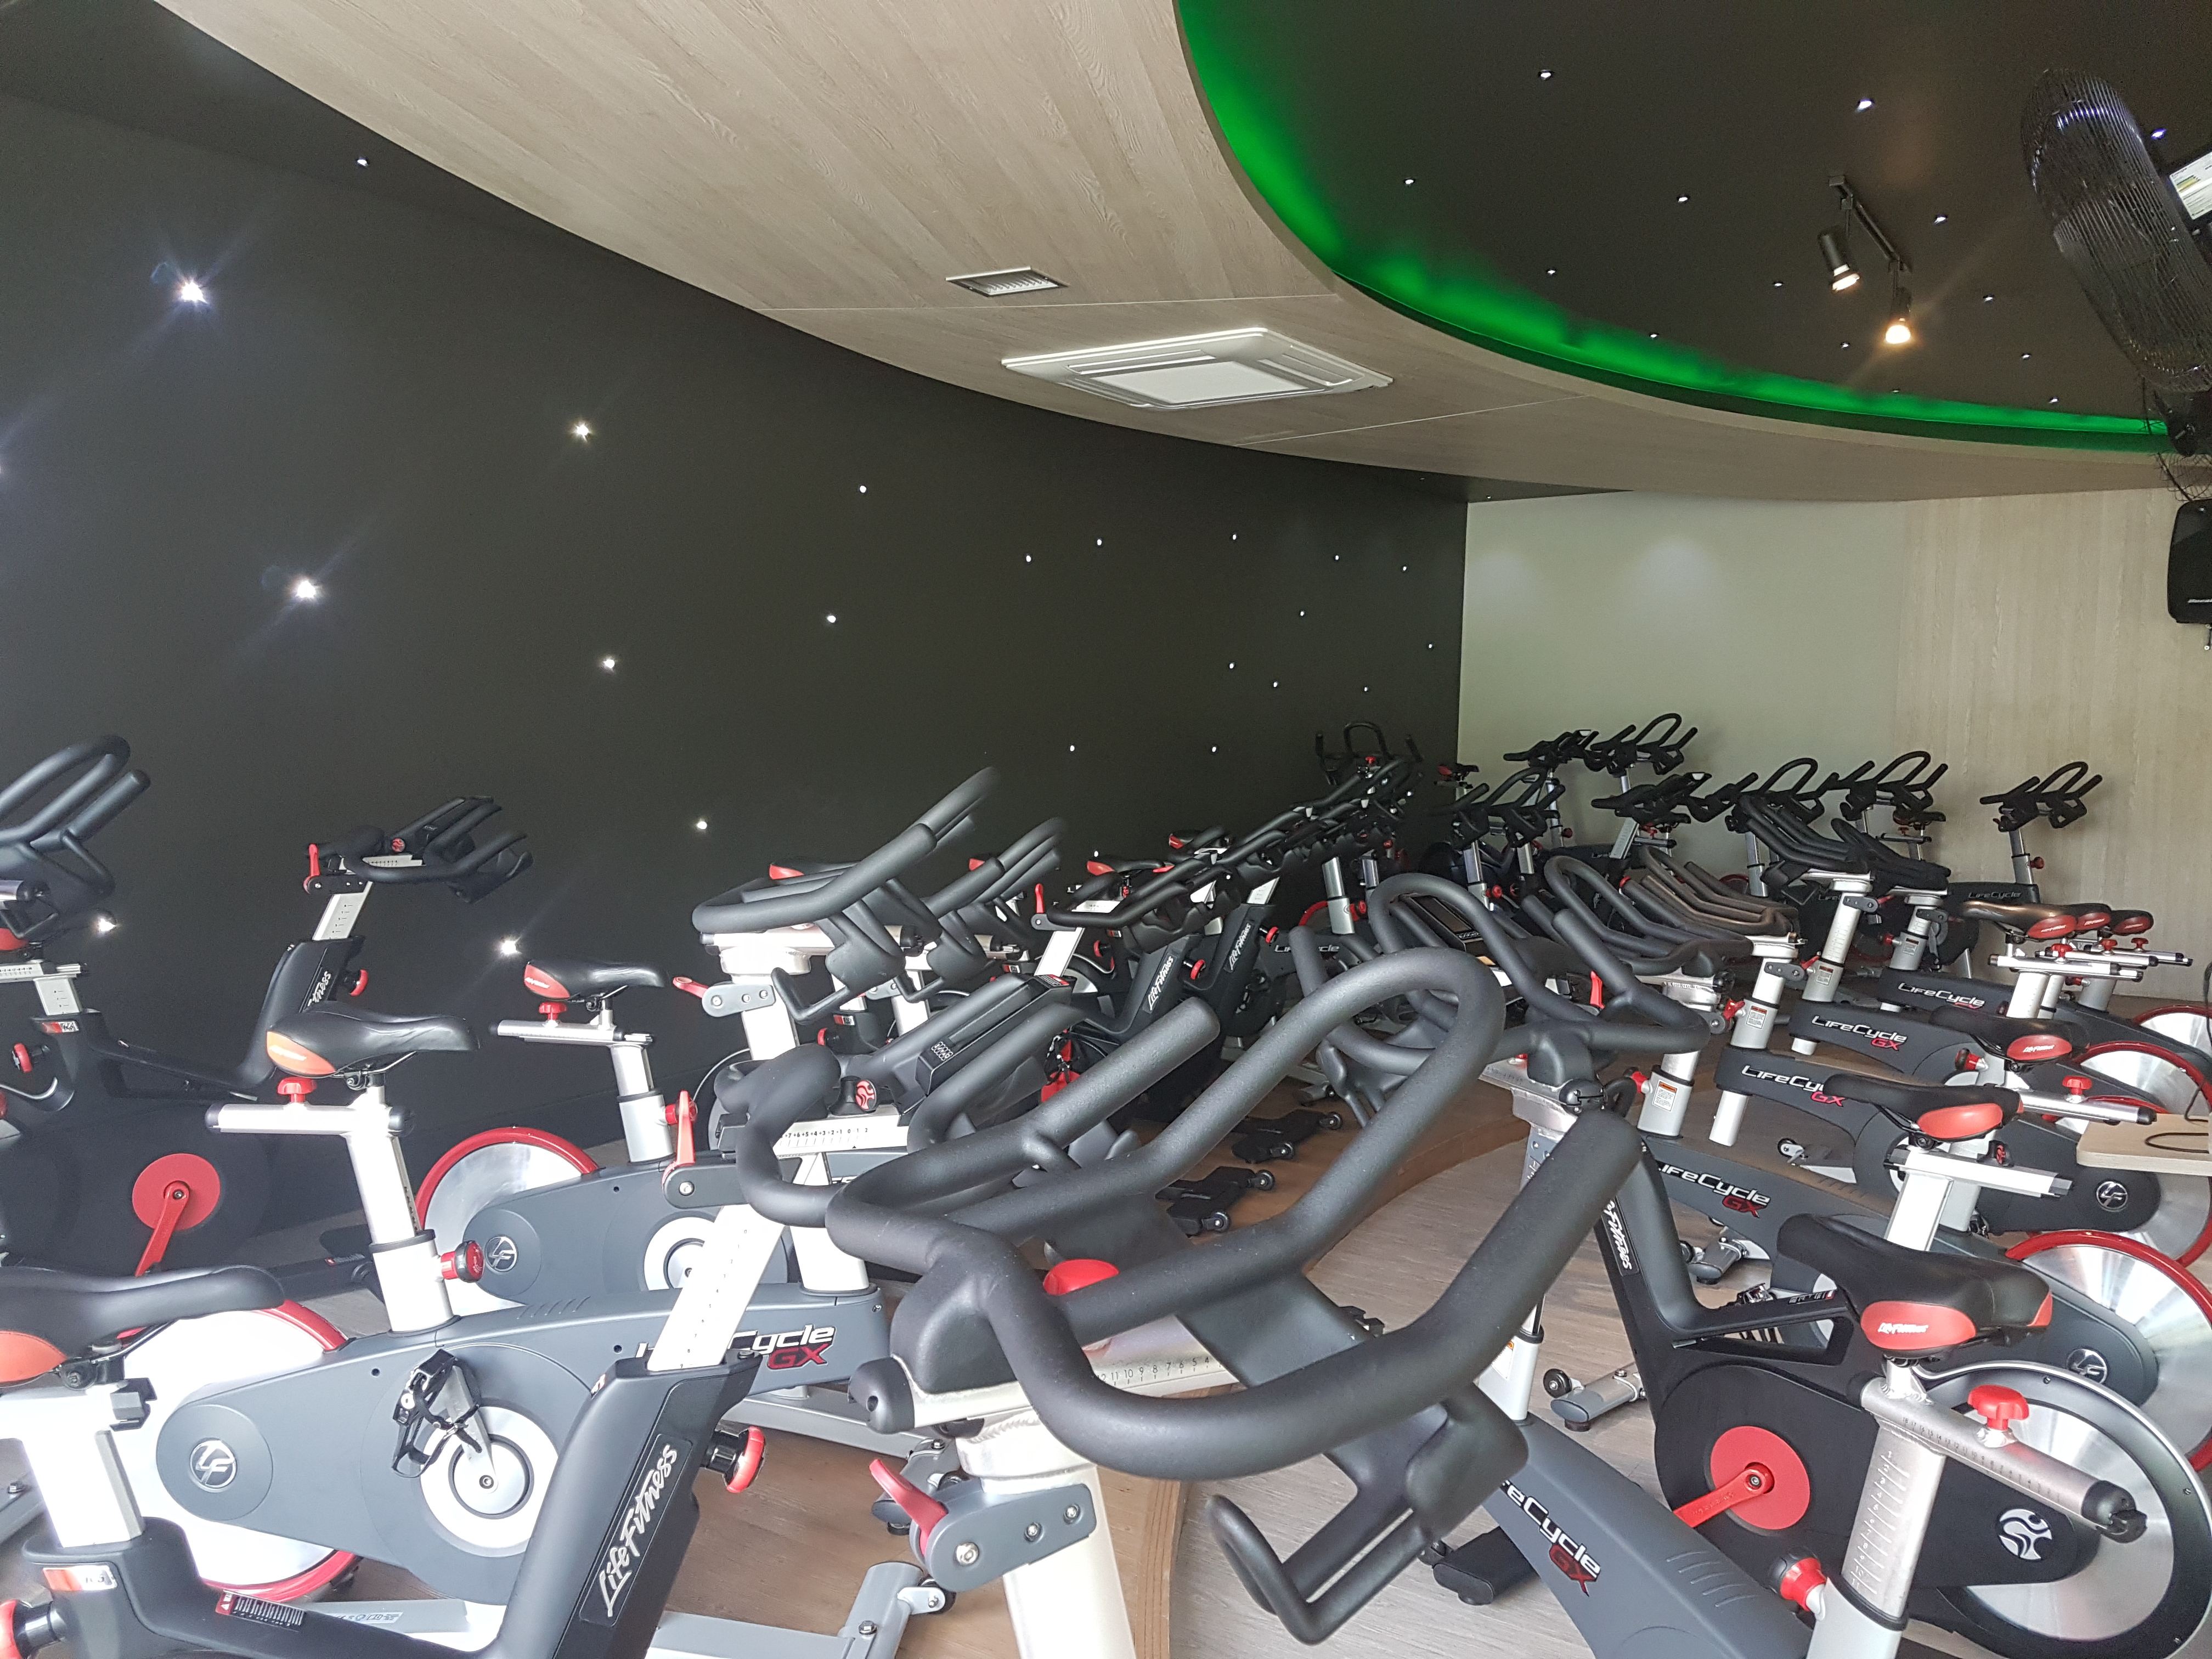 Sala de Spinning | Bikes importadas